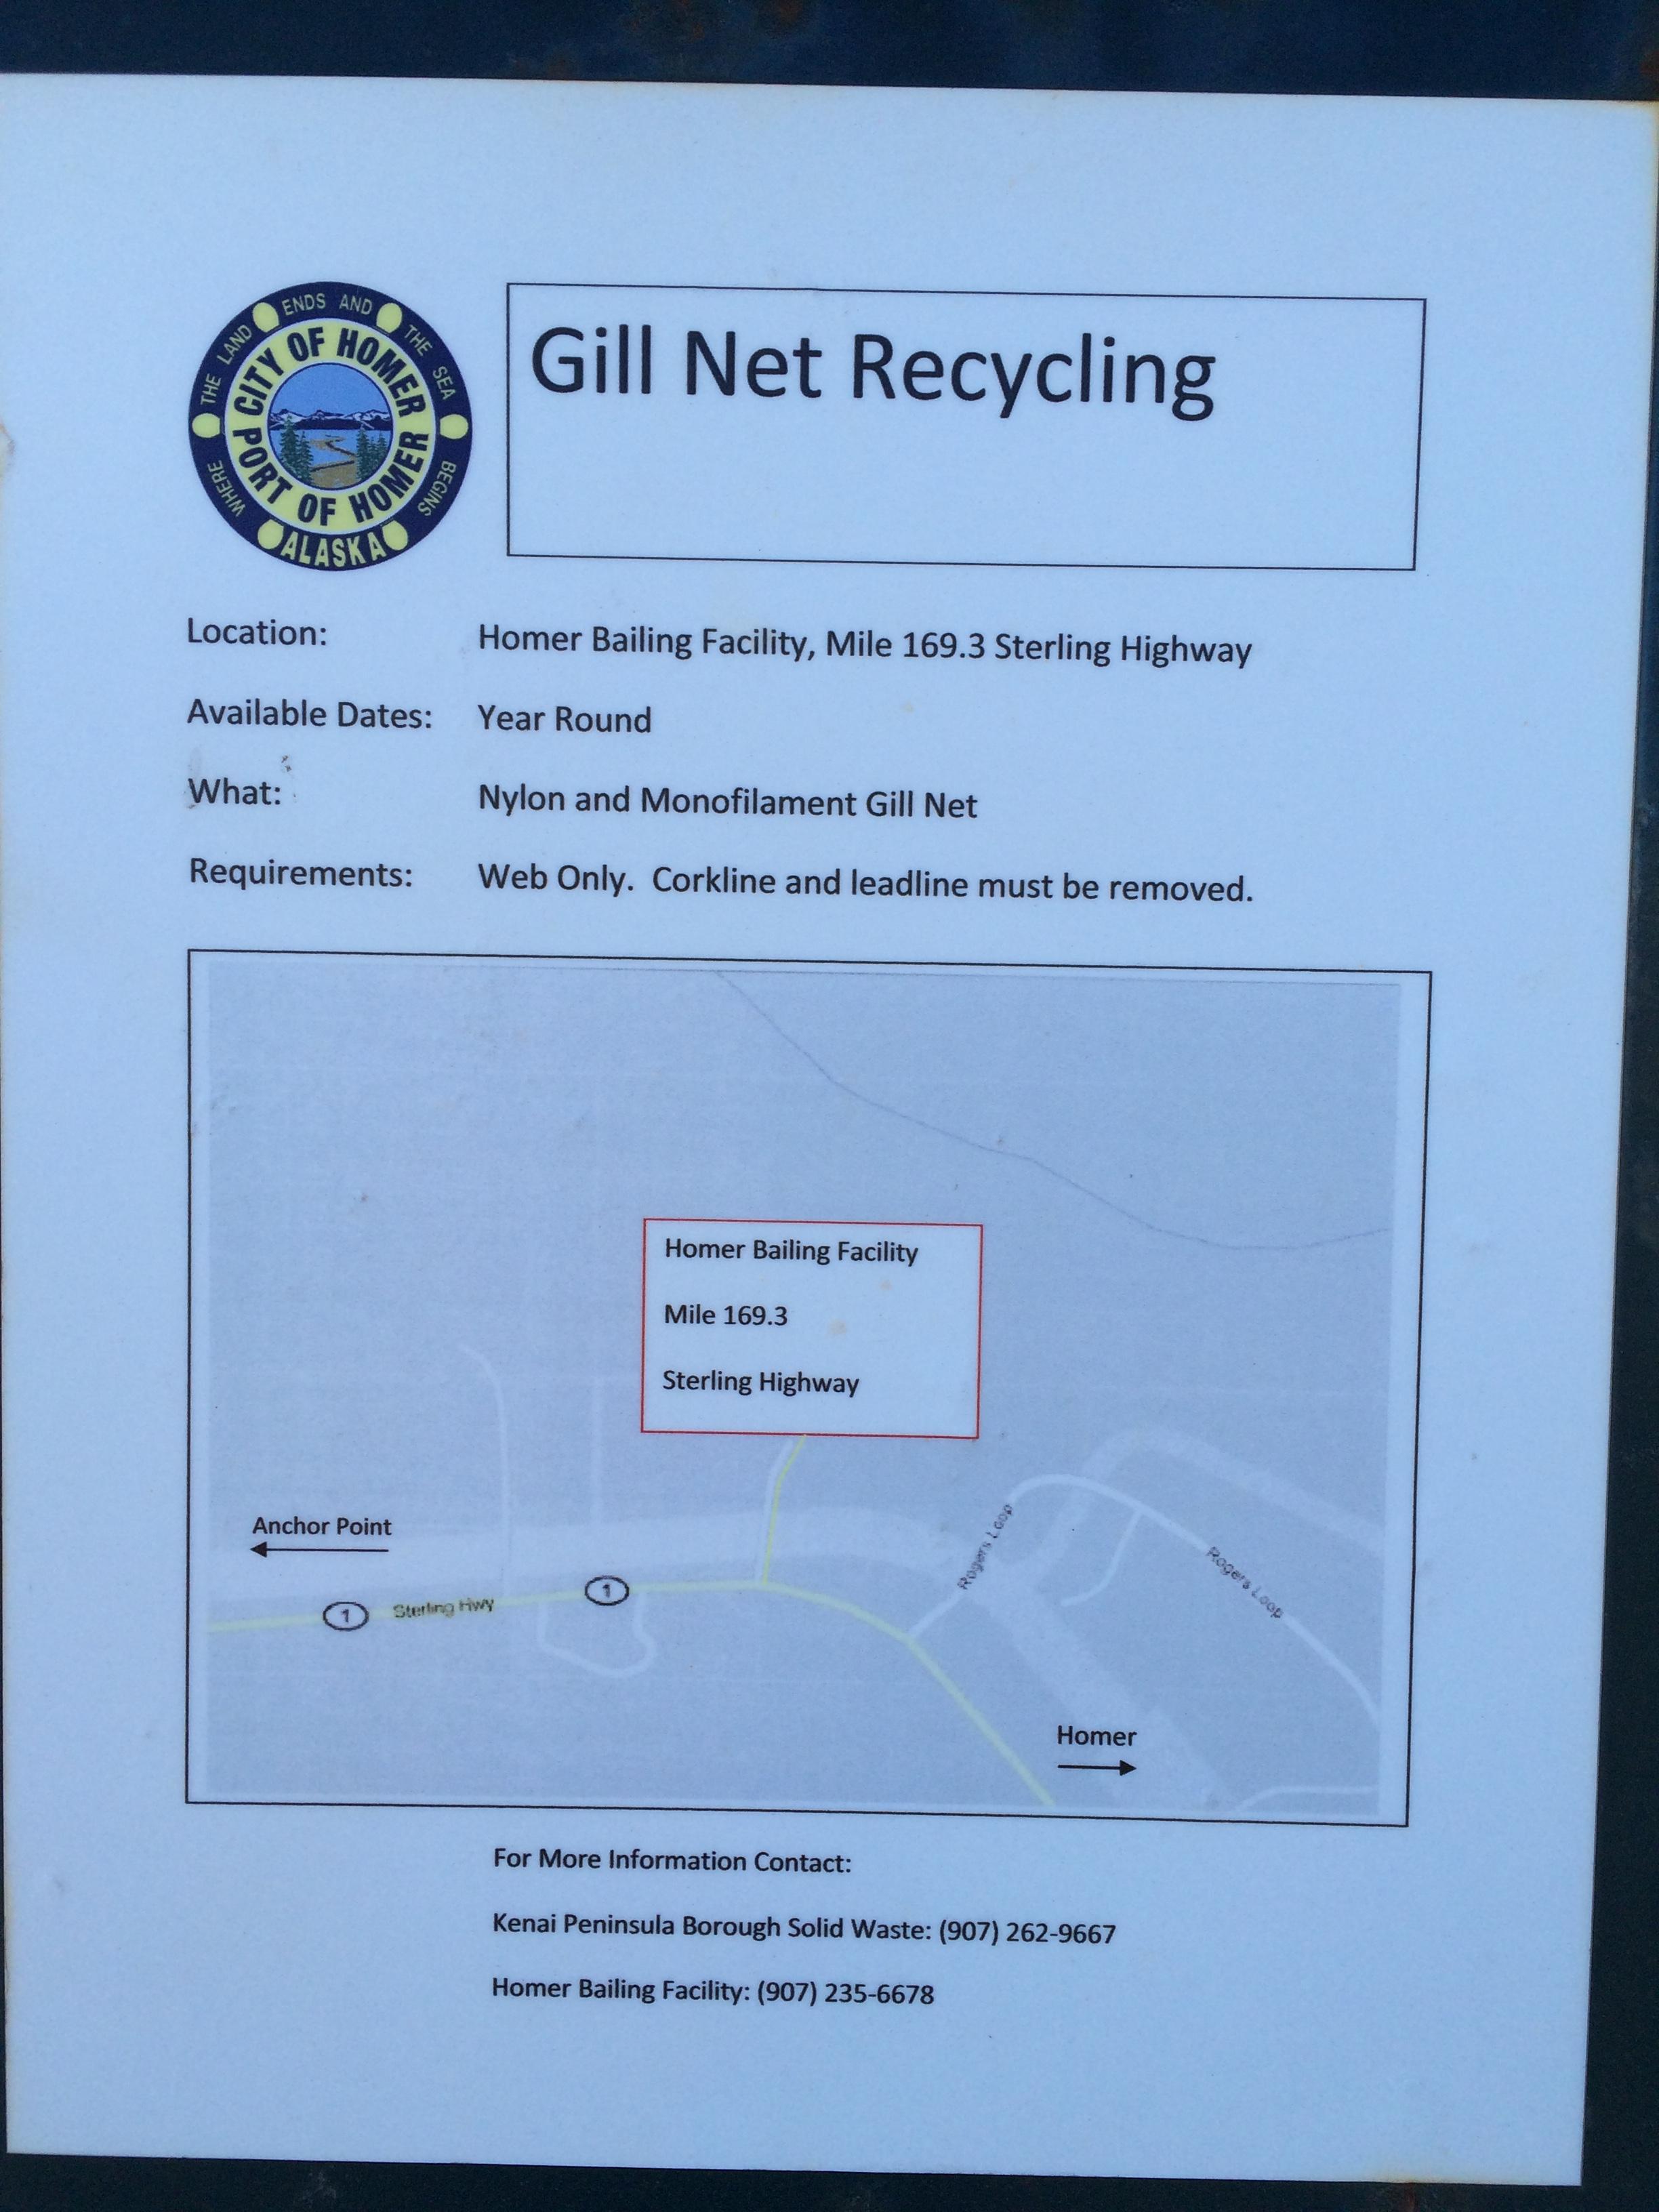 gillnet recycling sign.JPG